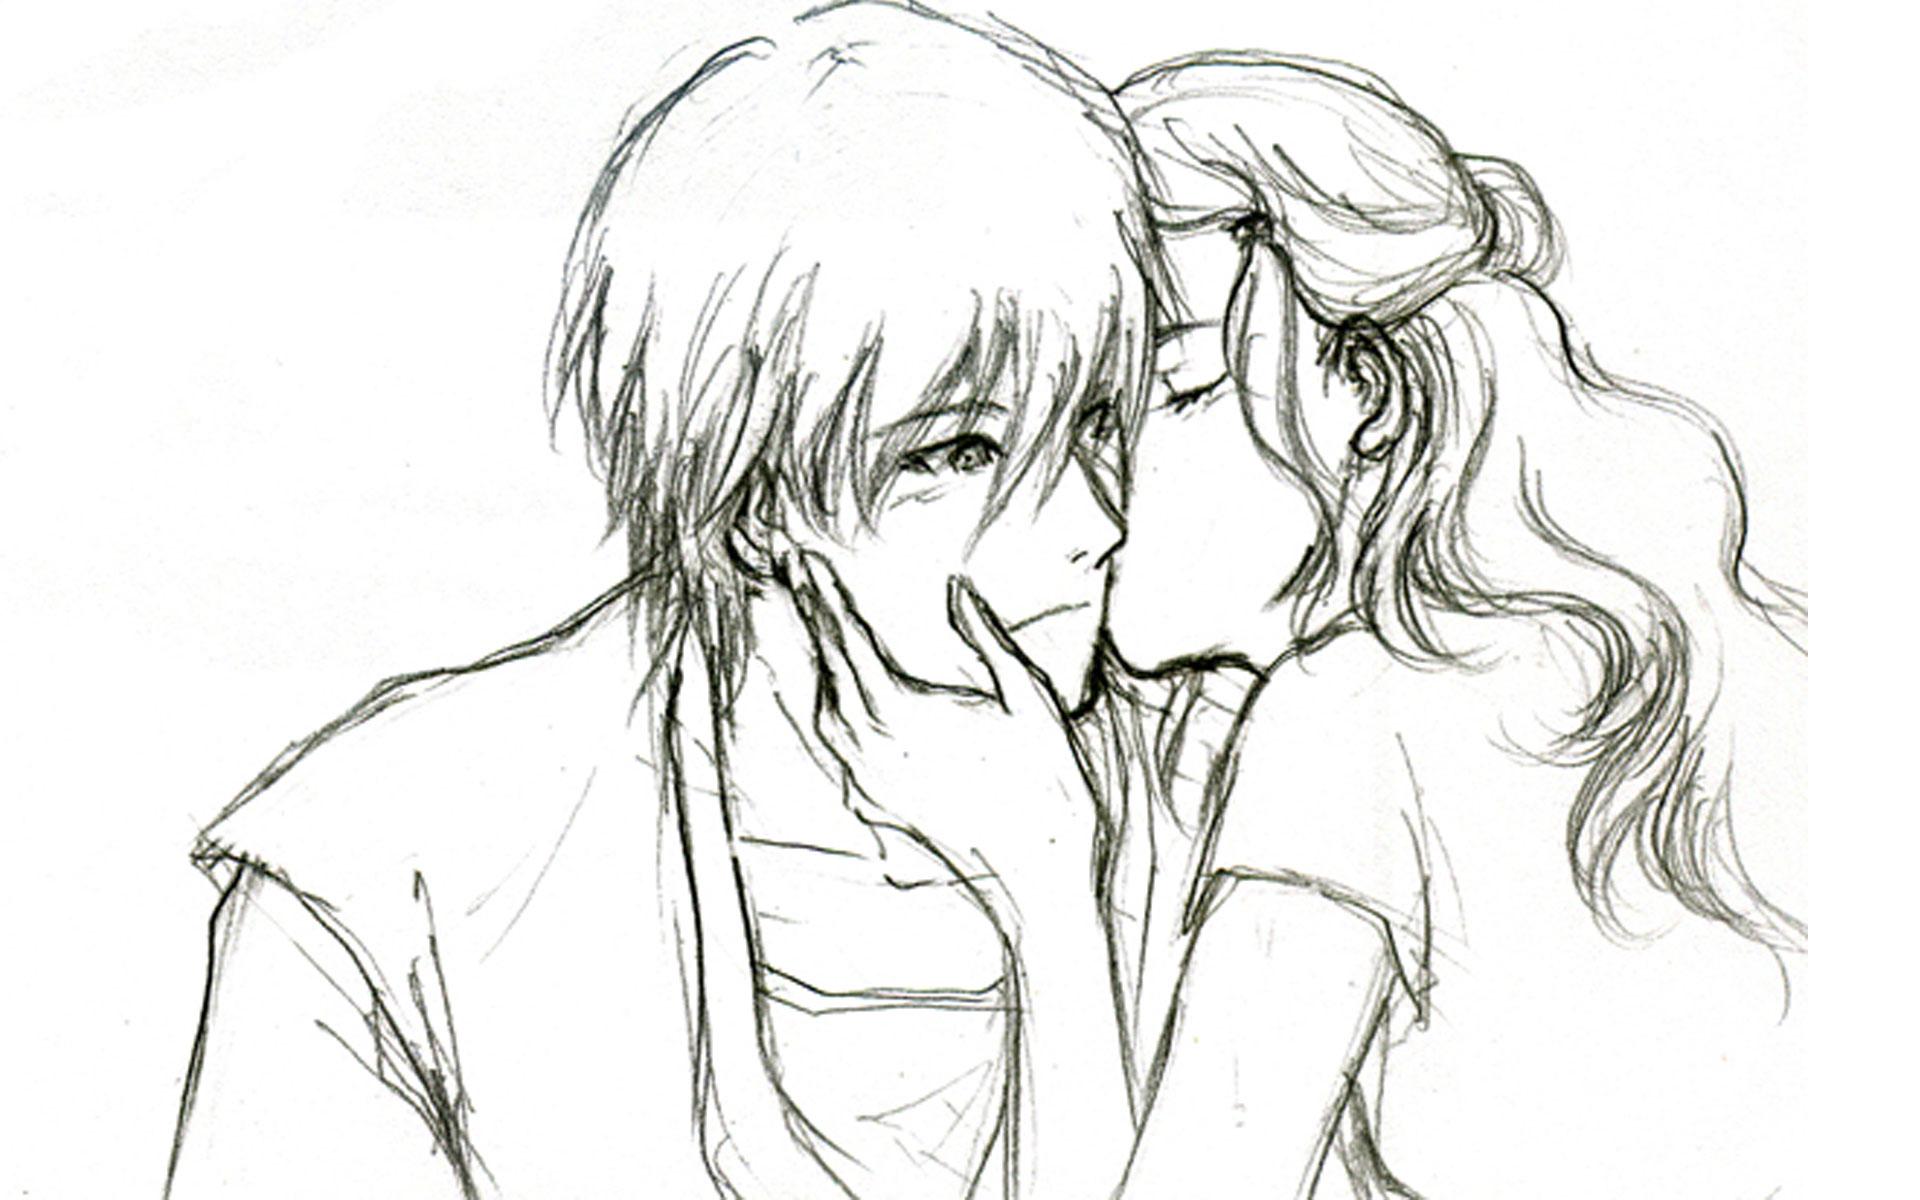 1920x1200 Anime Couple Kissing Drawing Romantic Anime Couples Kissing